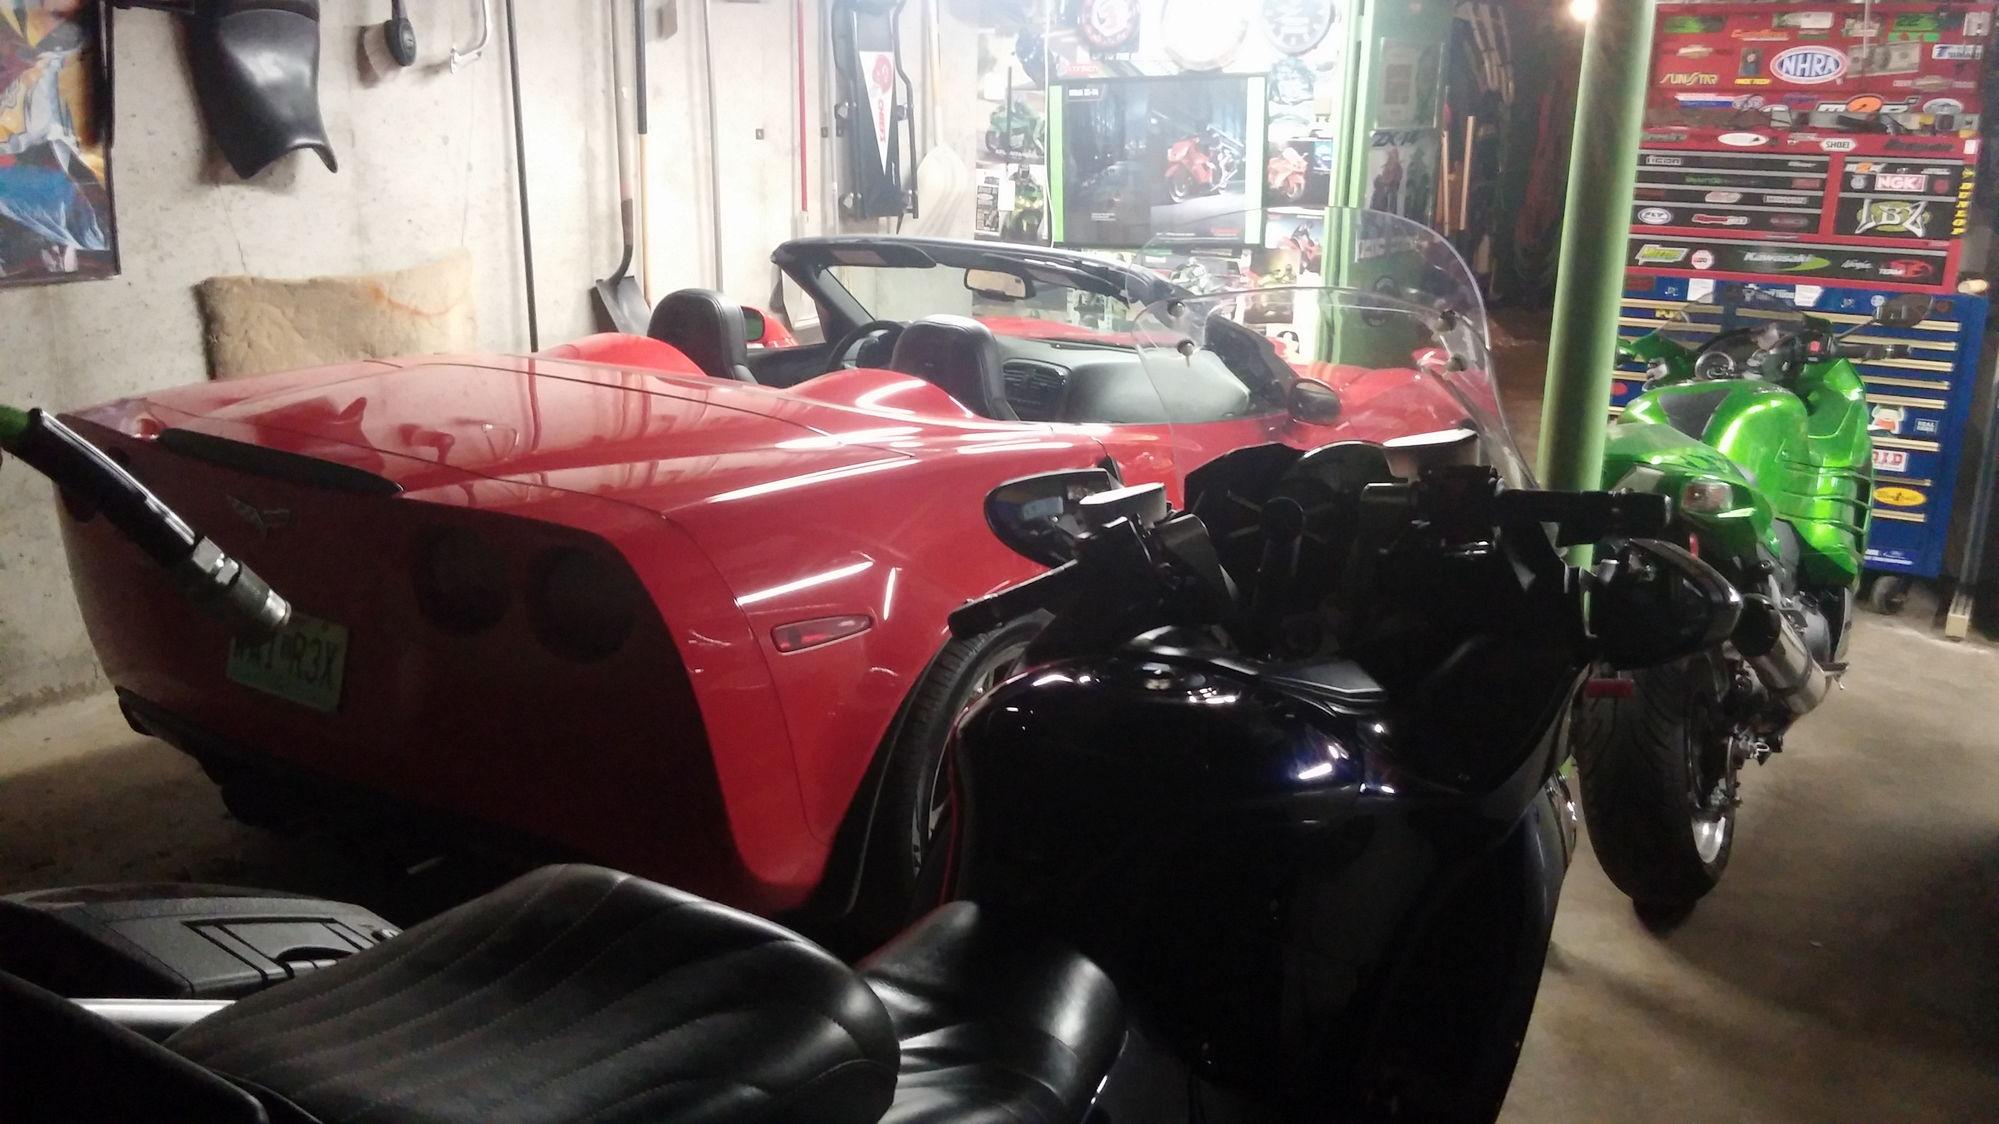 garage divider ideas - Garage divider ideas Wife dings my door CorvetteForum